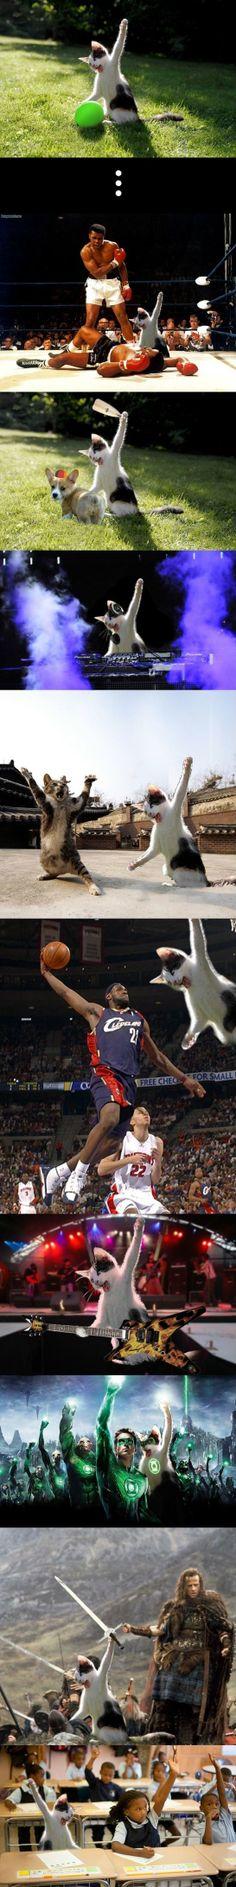 Cat Killing The Balloon - www.meme-lol.com